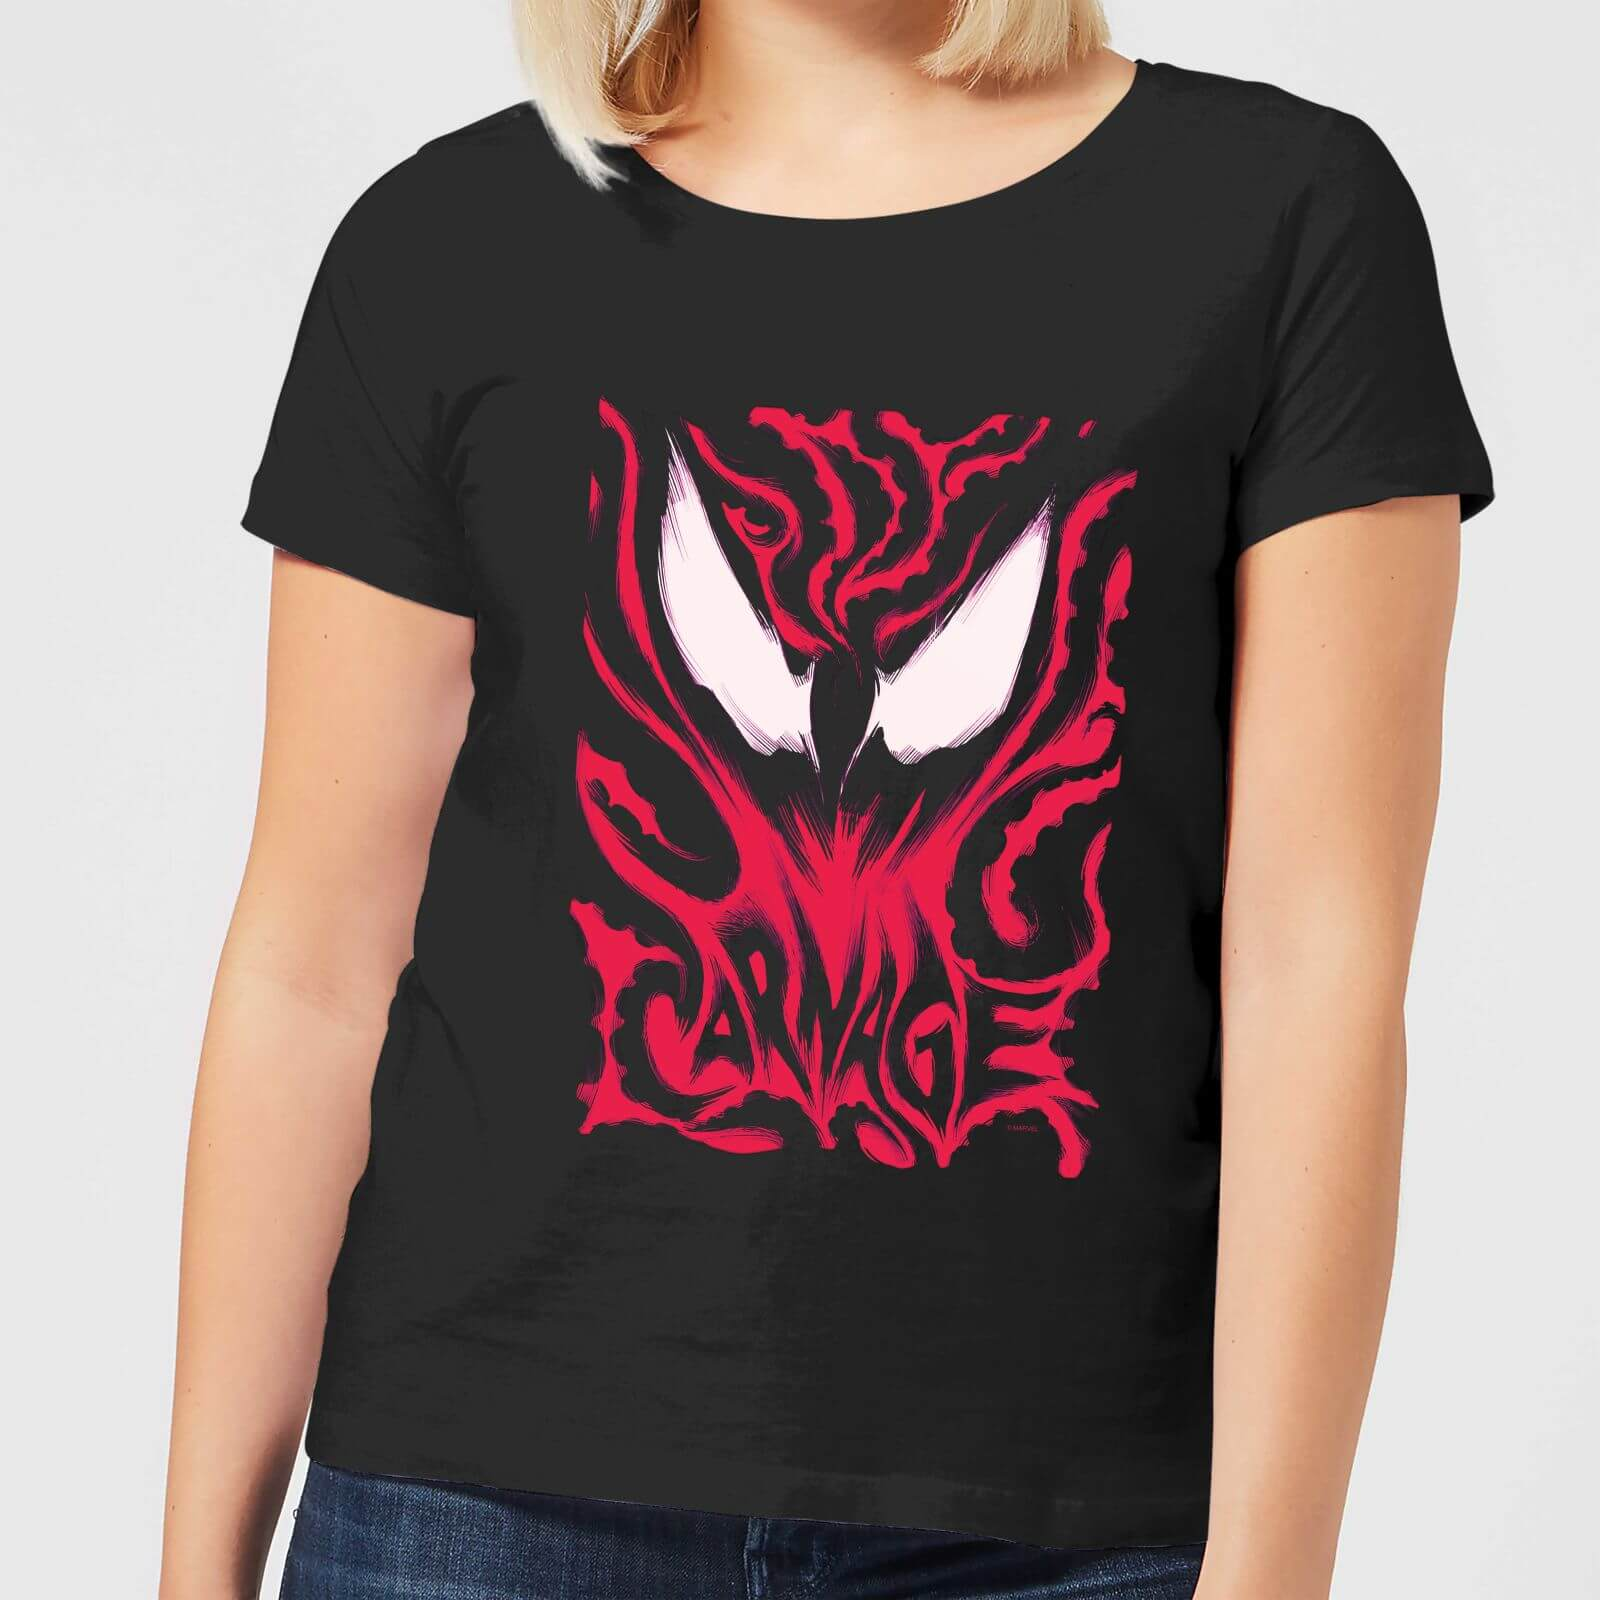 4145d0bb0 Camiseta Marvel Venom Matanza - Mujer - Negro Clothing